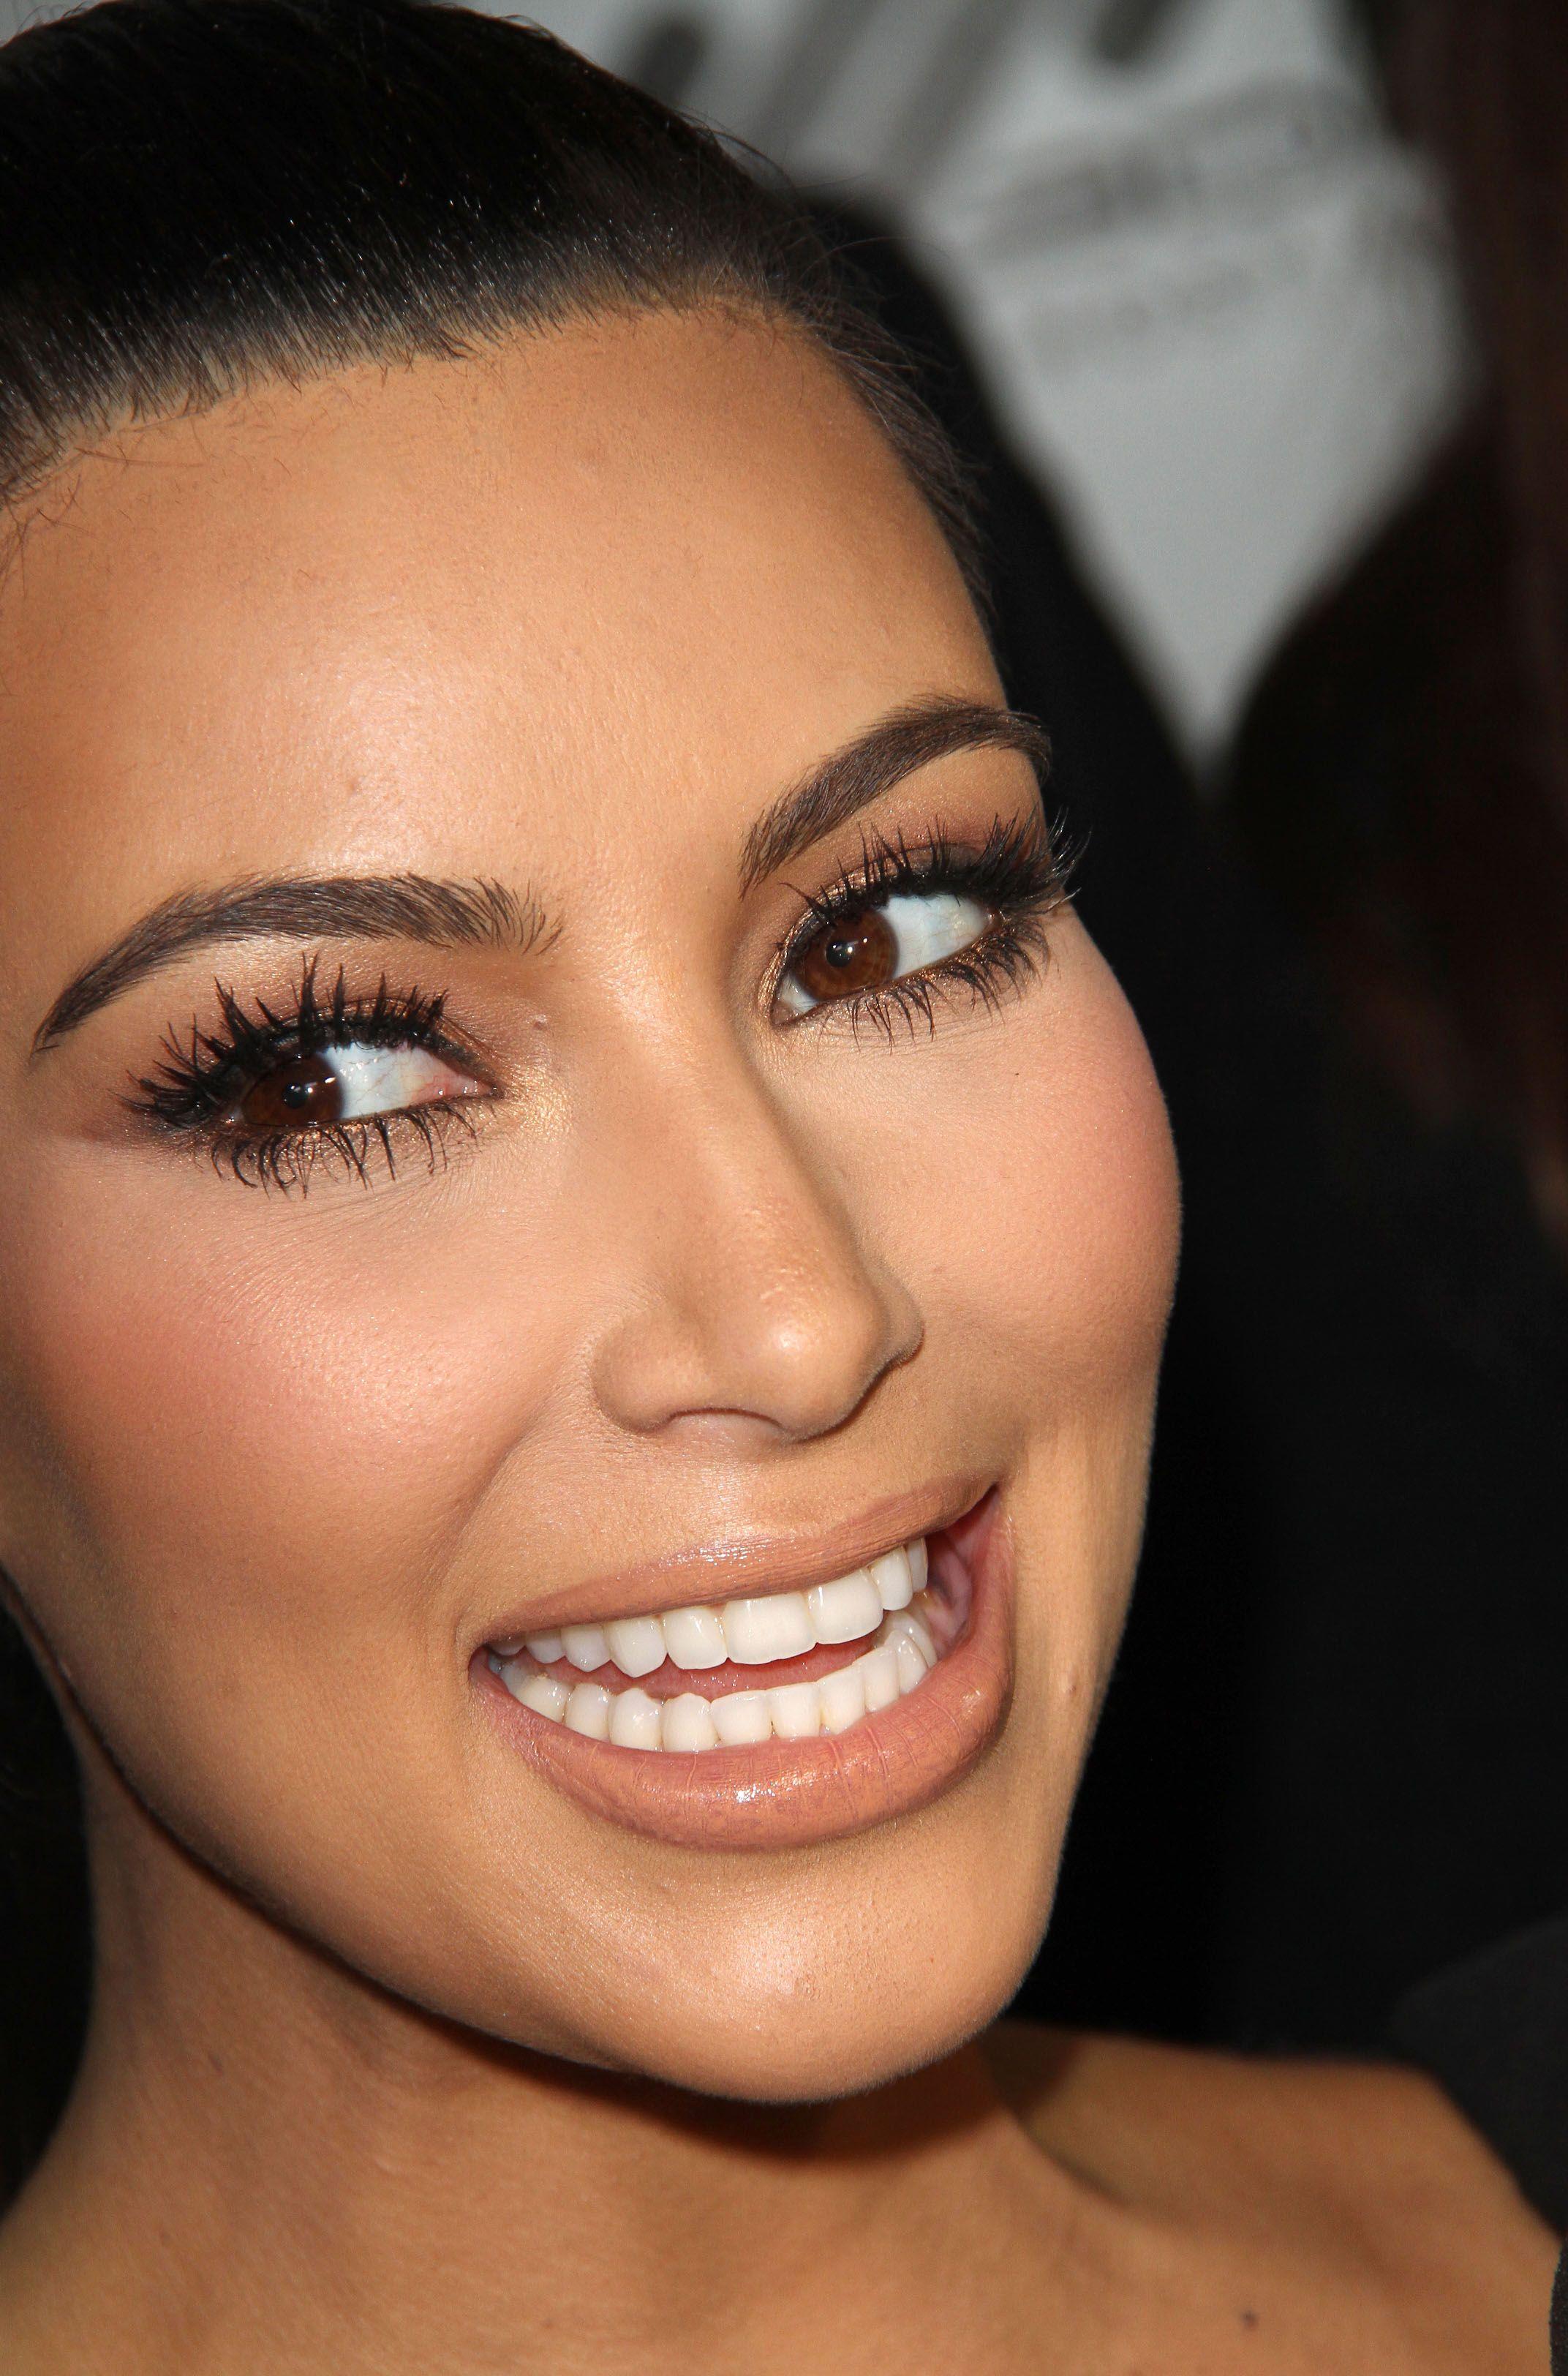 Pin by Auntie on Teeth in 2019 | Kim kardashian ...